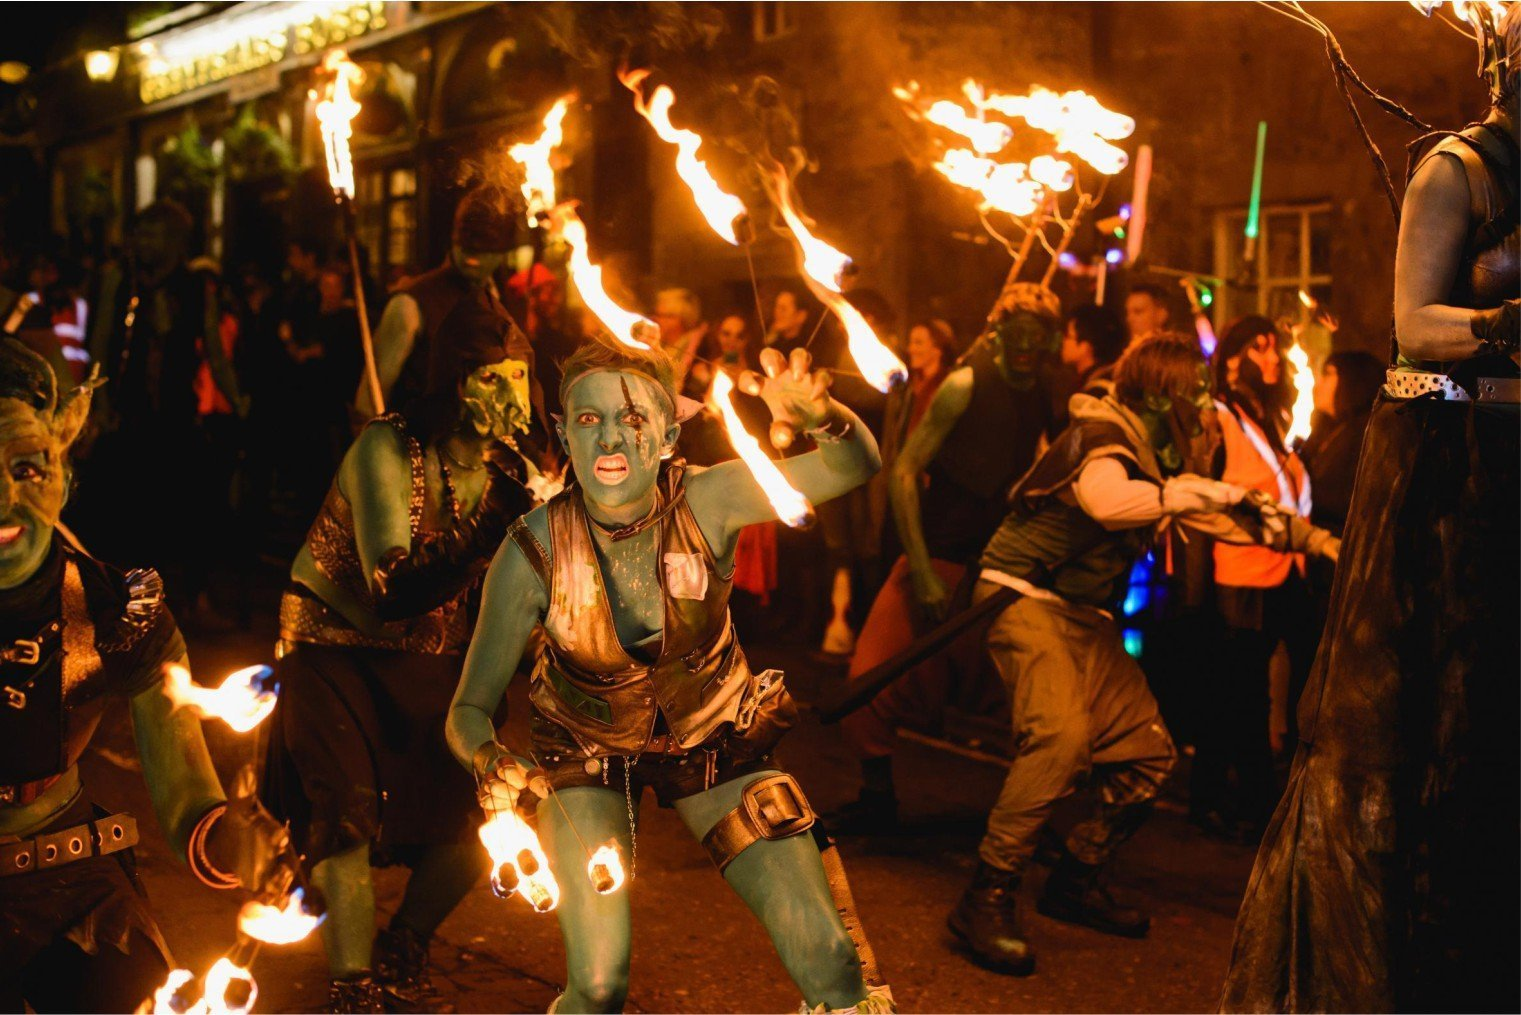 Beltane Fire Festival, Edinburgh. Фестиваль Огня Белтейн